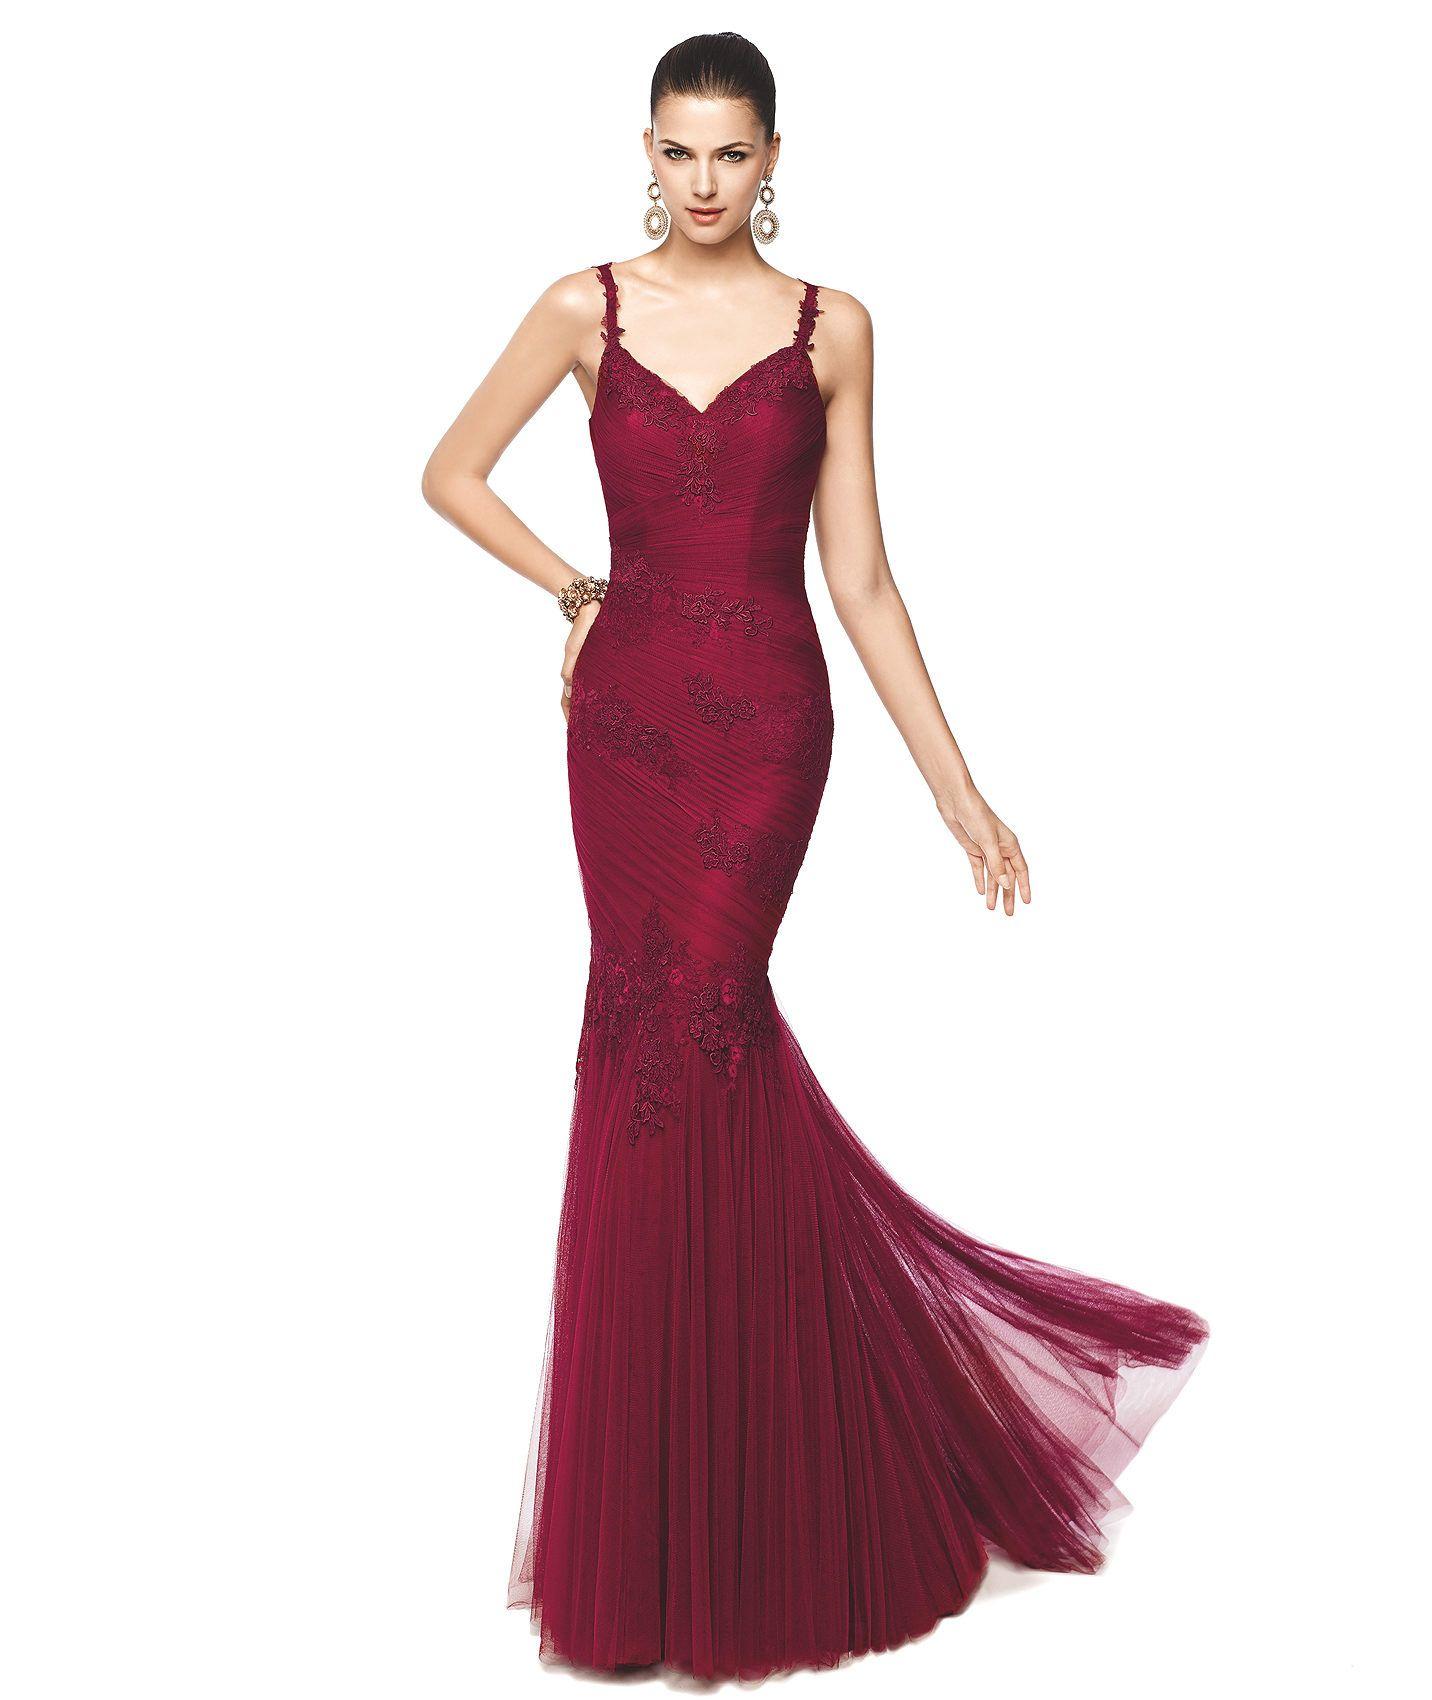 Vestido corte princesa color vino